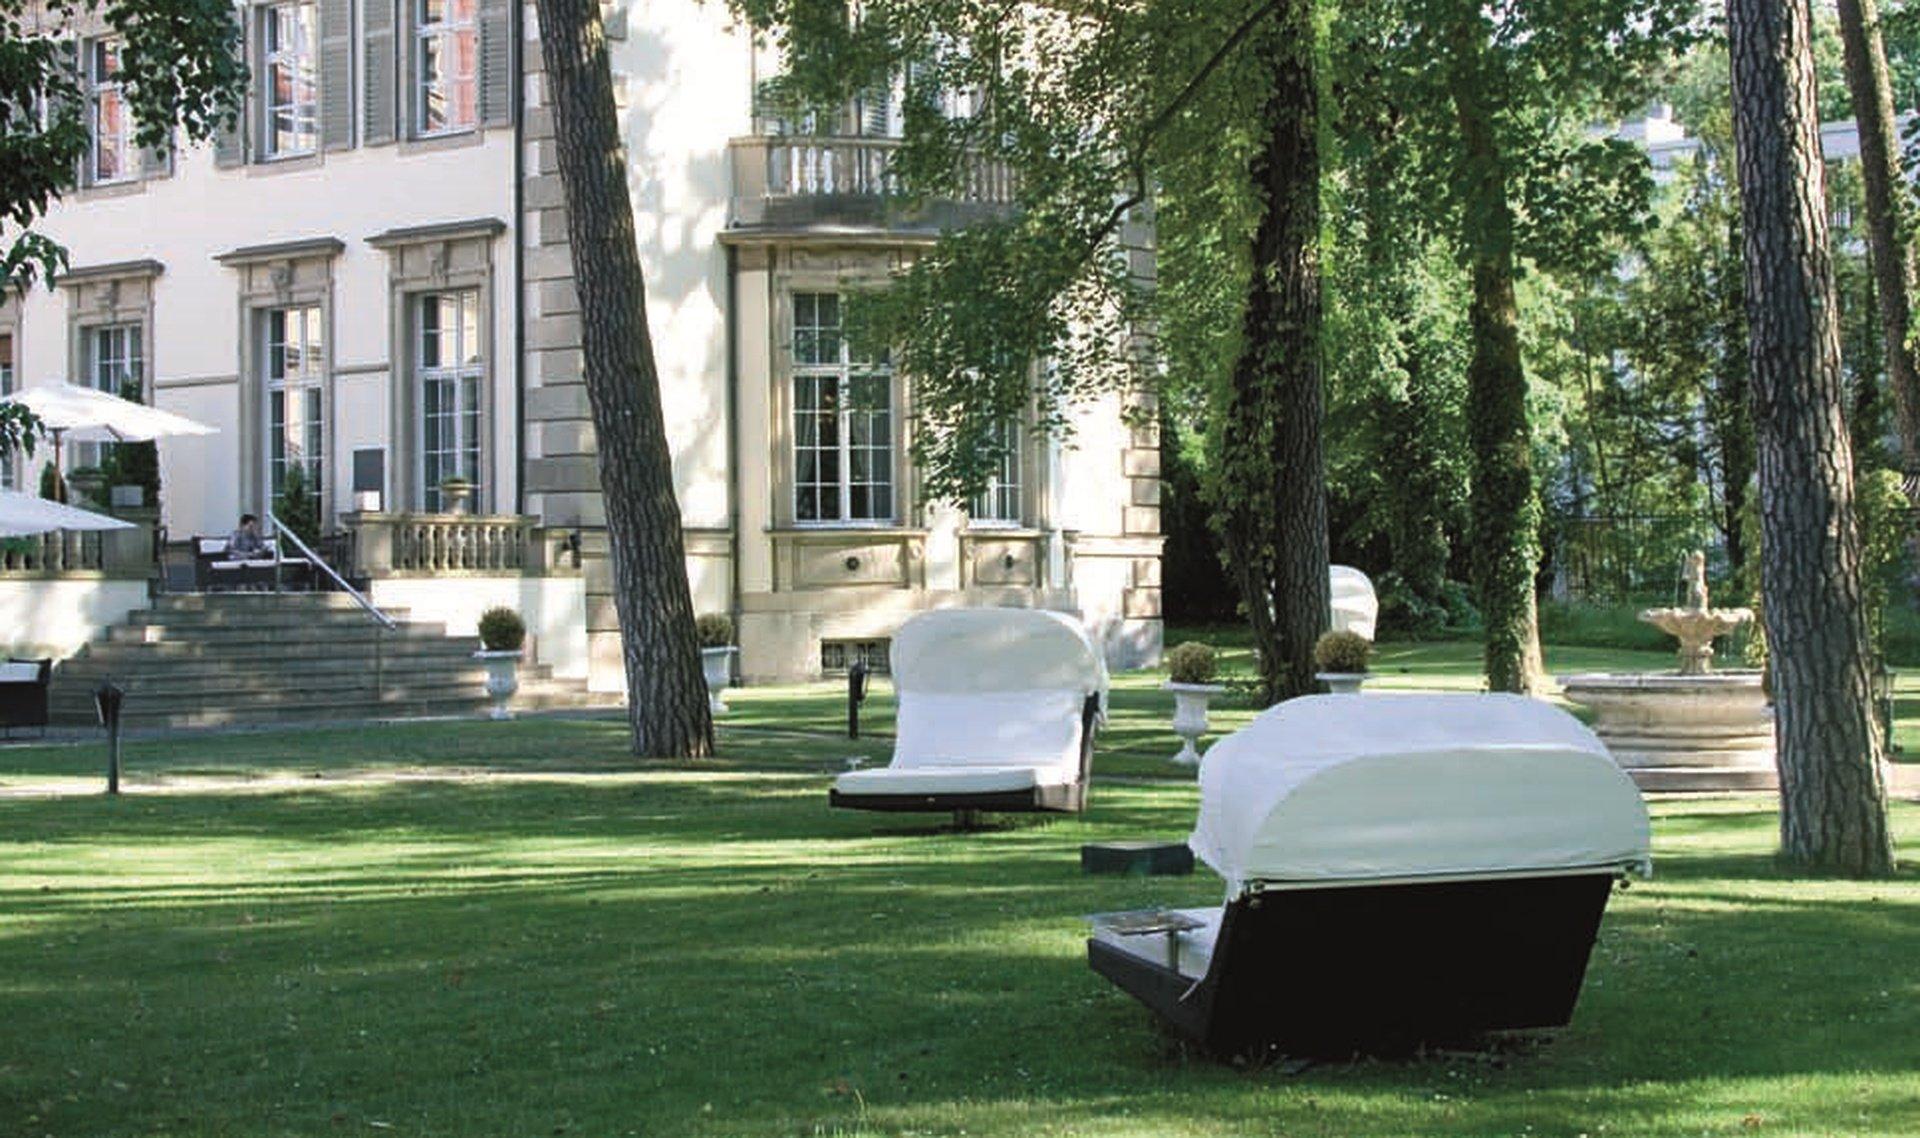 Berlin workshop spaces Patio / Cour extérieure Garden - SCHLOSSHOTEL IM GRUNEWALD image 0